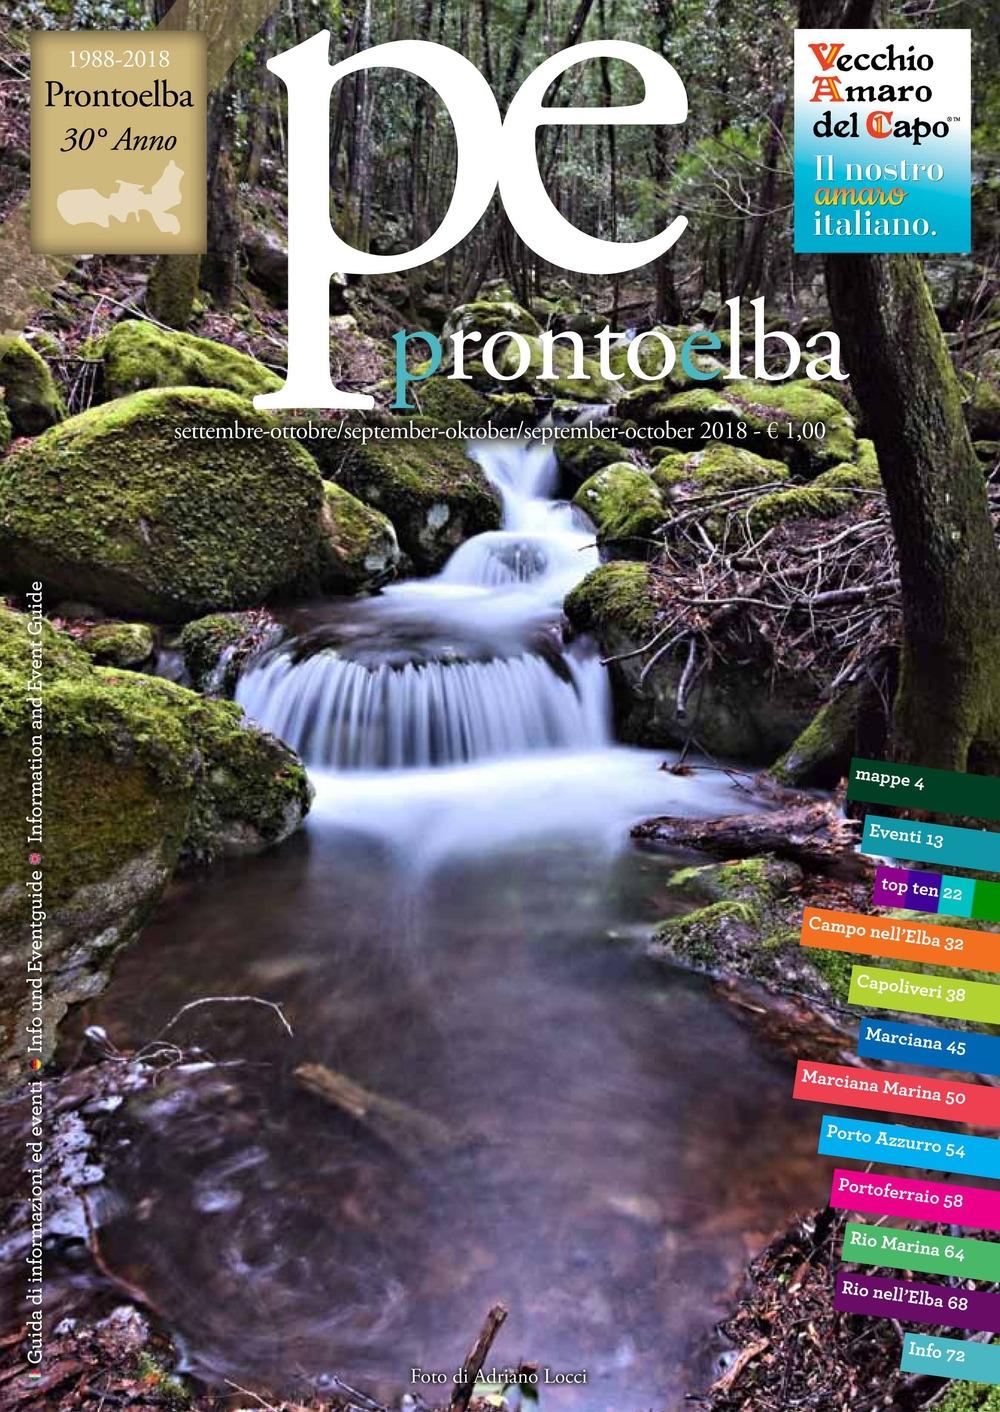 ProntoElba. Settembre-ottobre 2018. Vol. 8